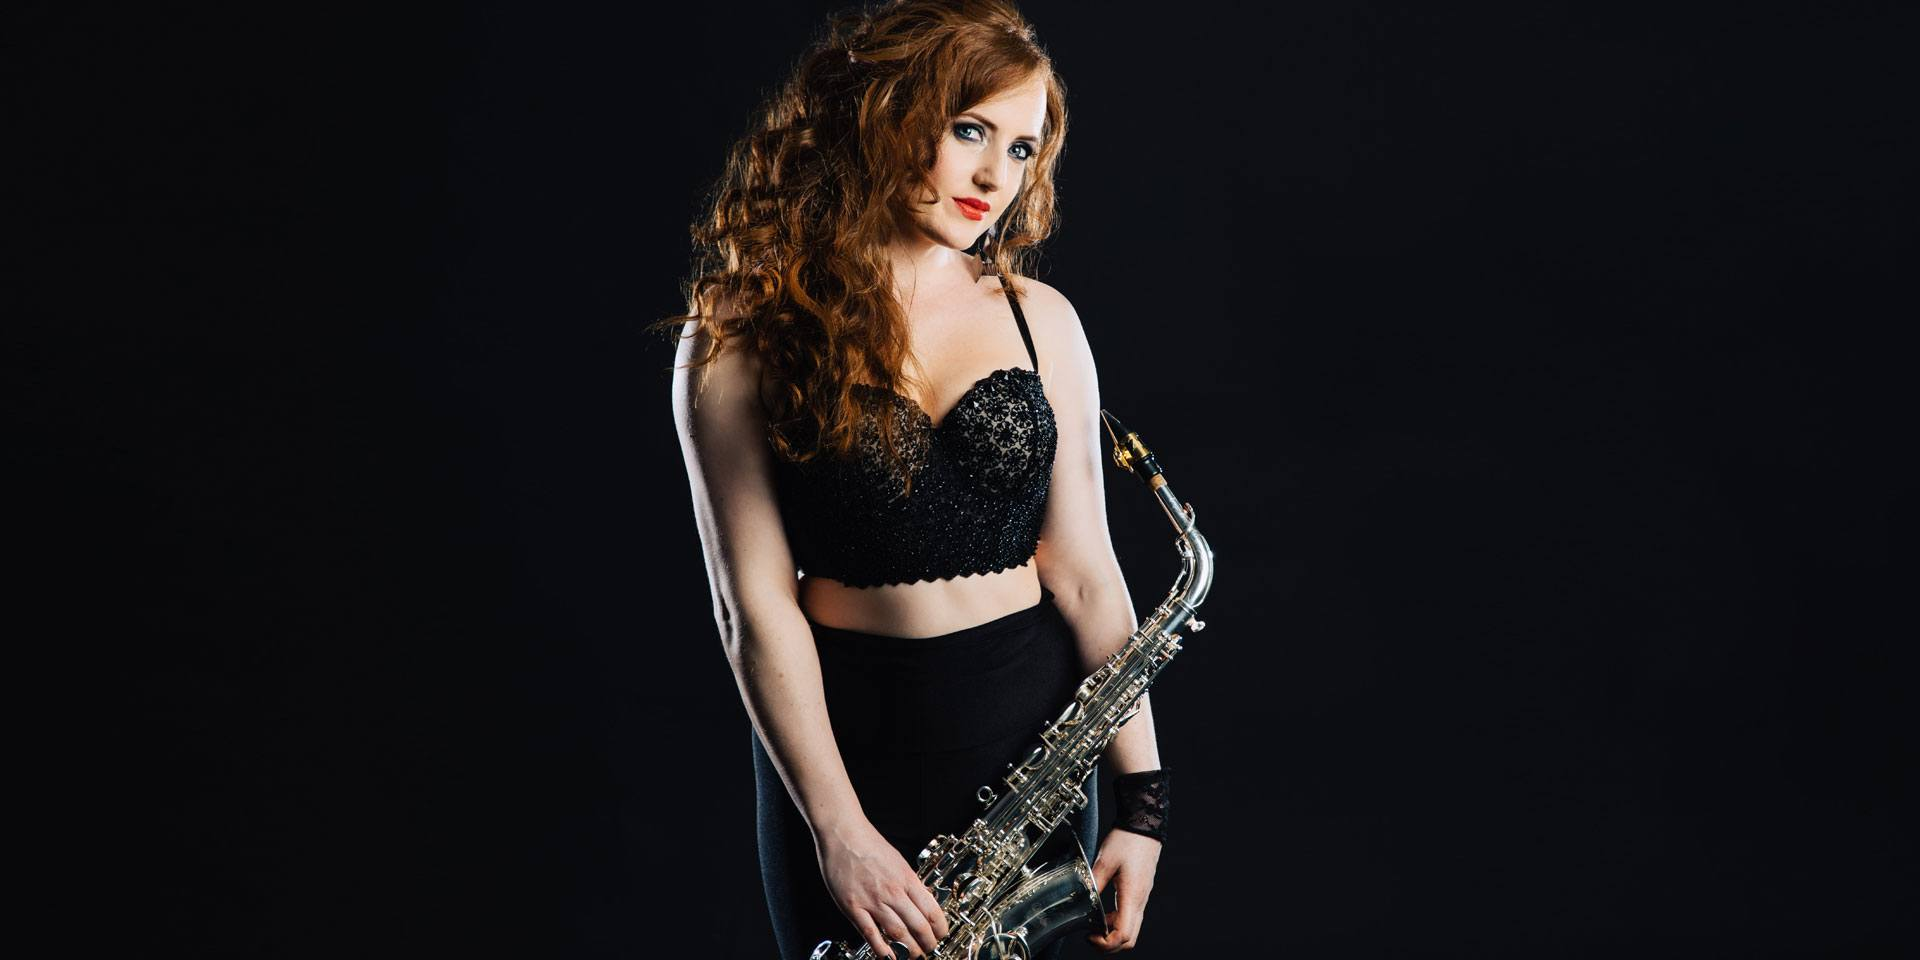 Saxophonist London